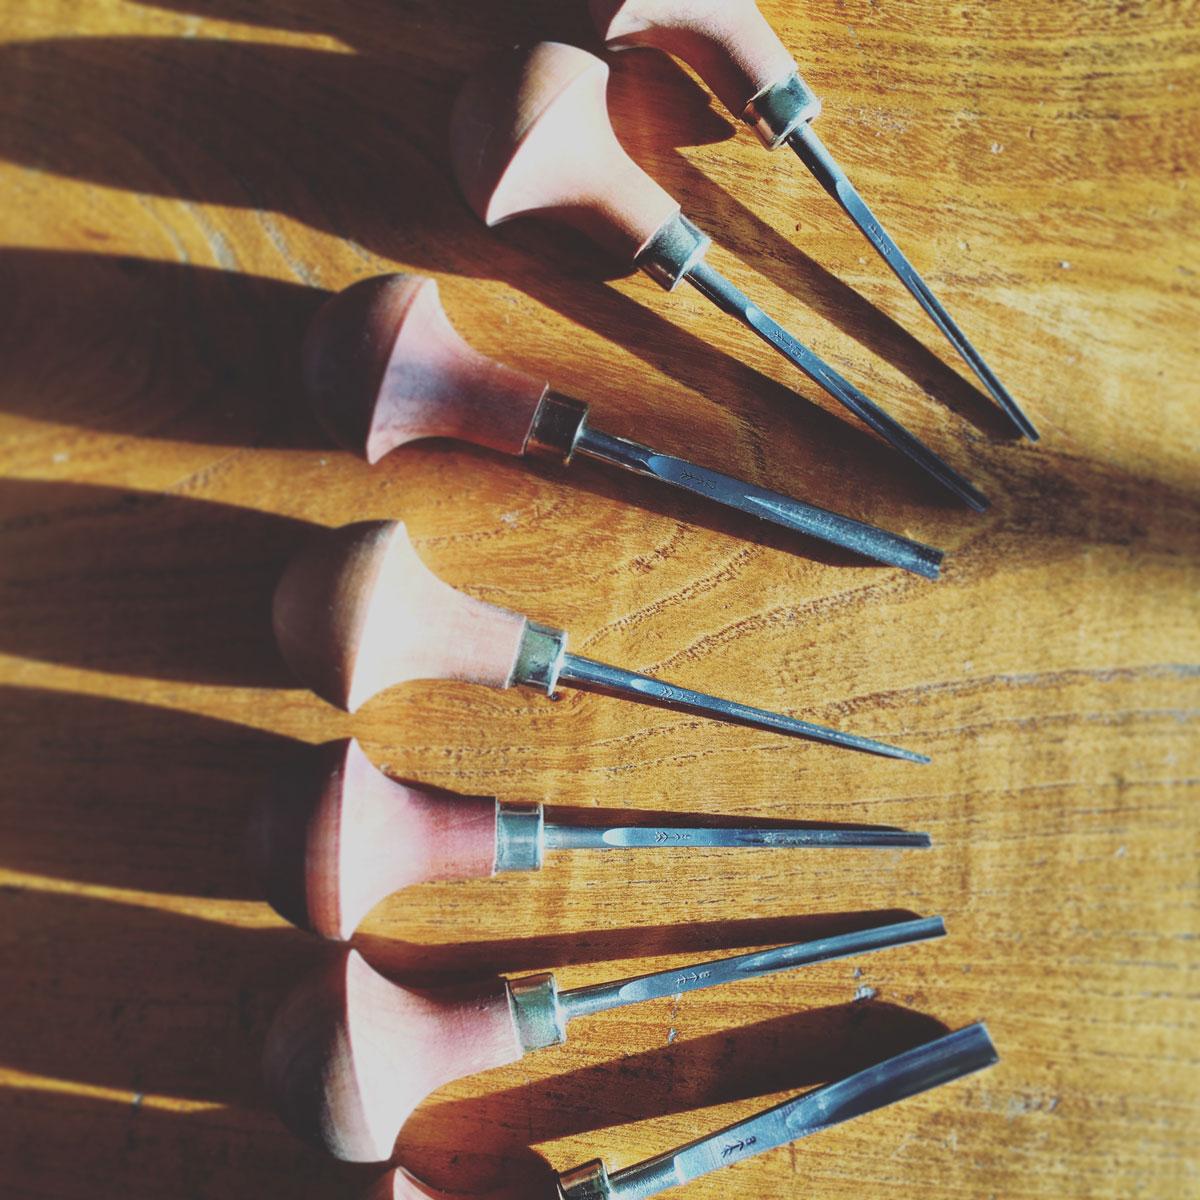 Pfeil lino cutting tools a guide by draw cut ink press